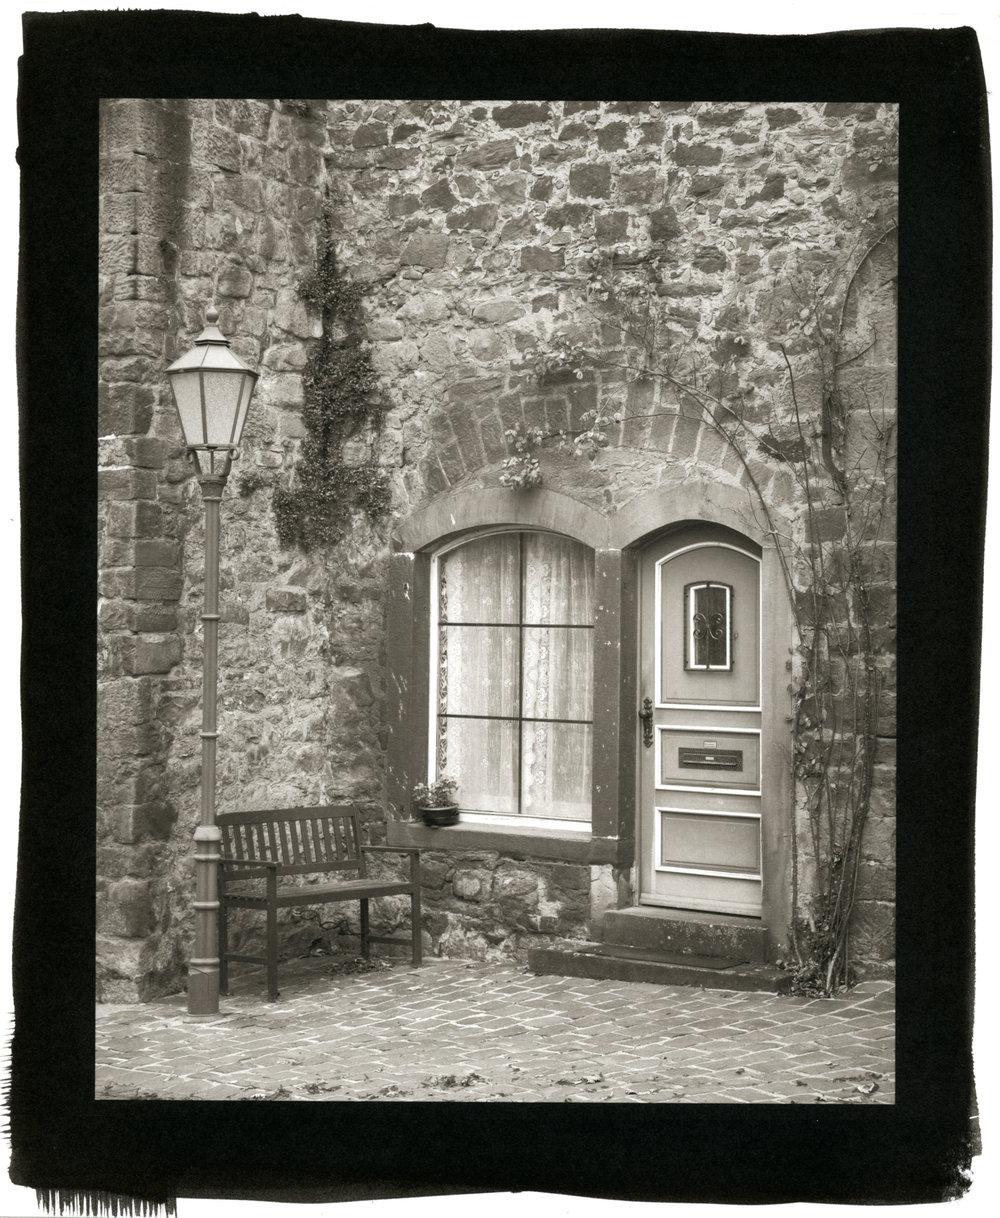 "Door, Büdingen (Platinum/Palladium Print, 8 x 10"")"